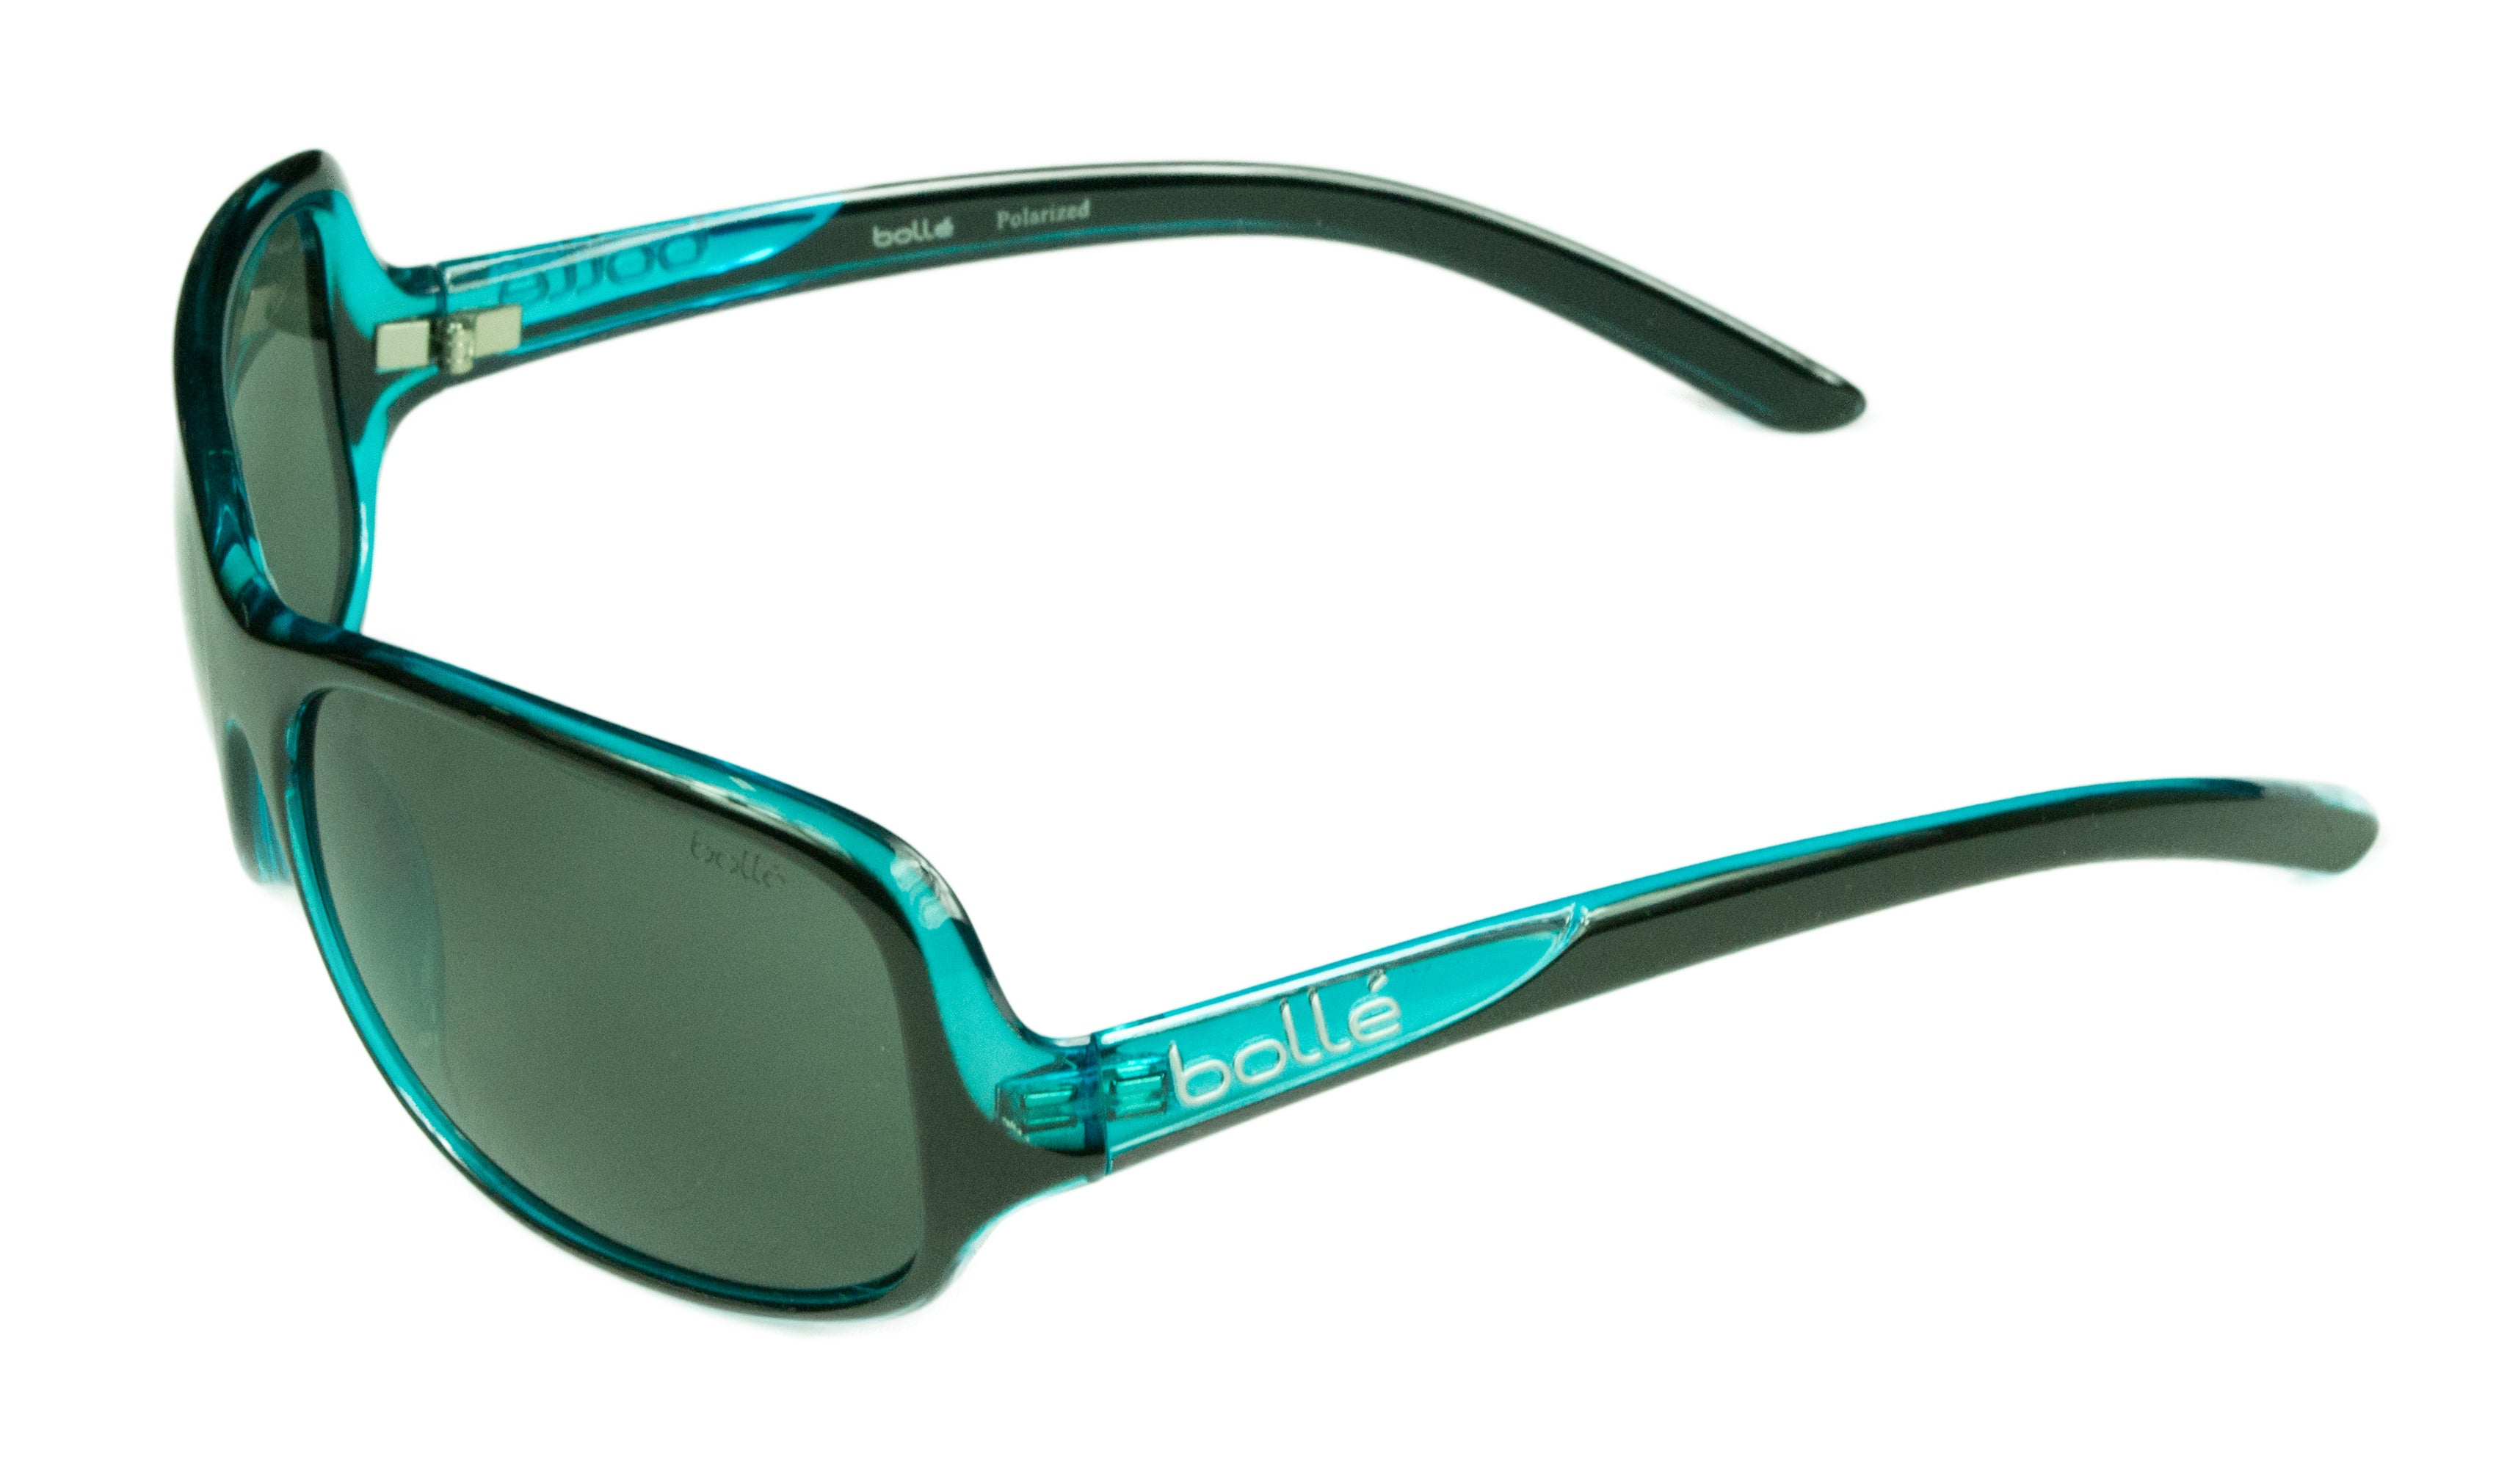 Bolle Kassia Women's Polarized UV Sunglasses